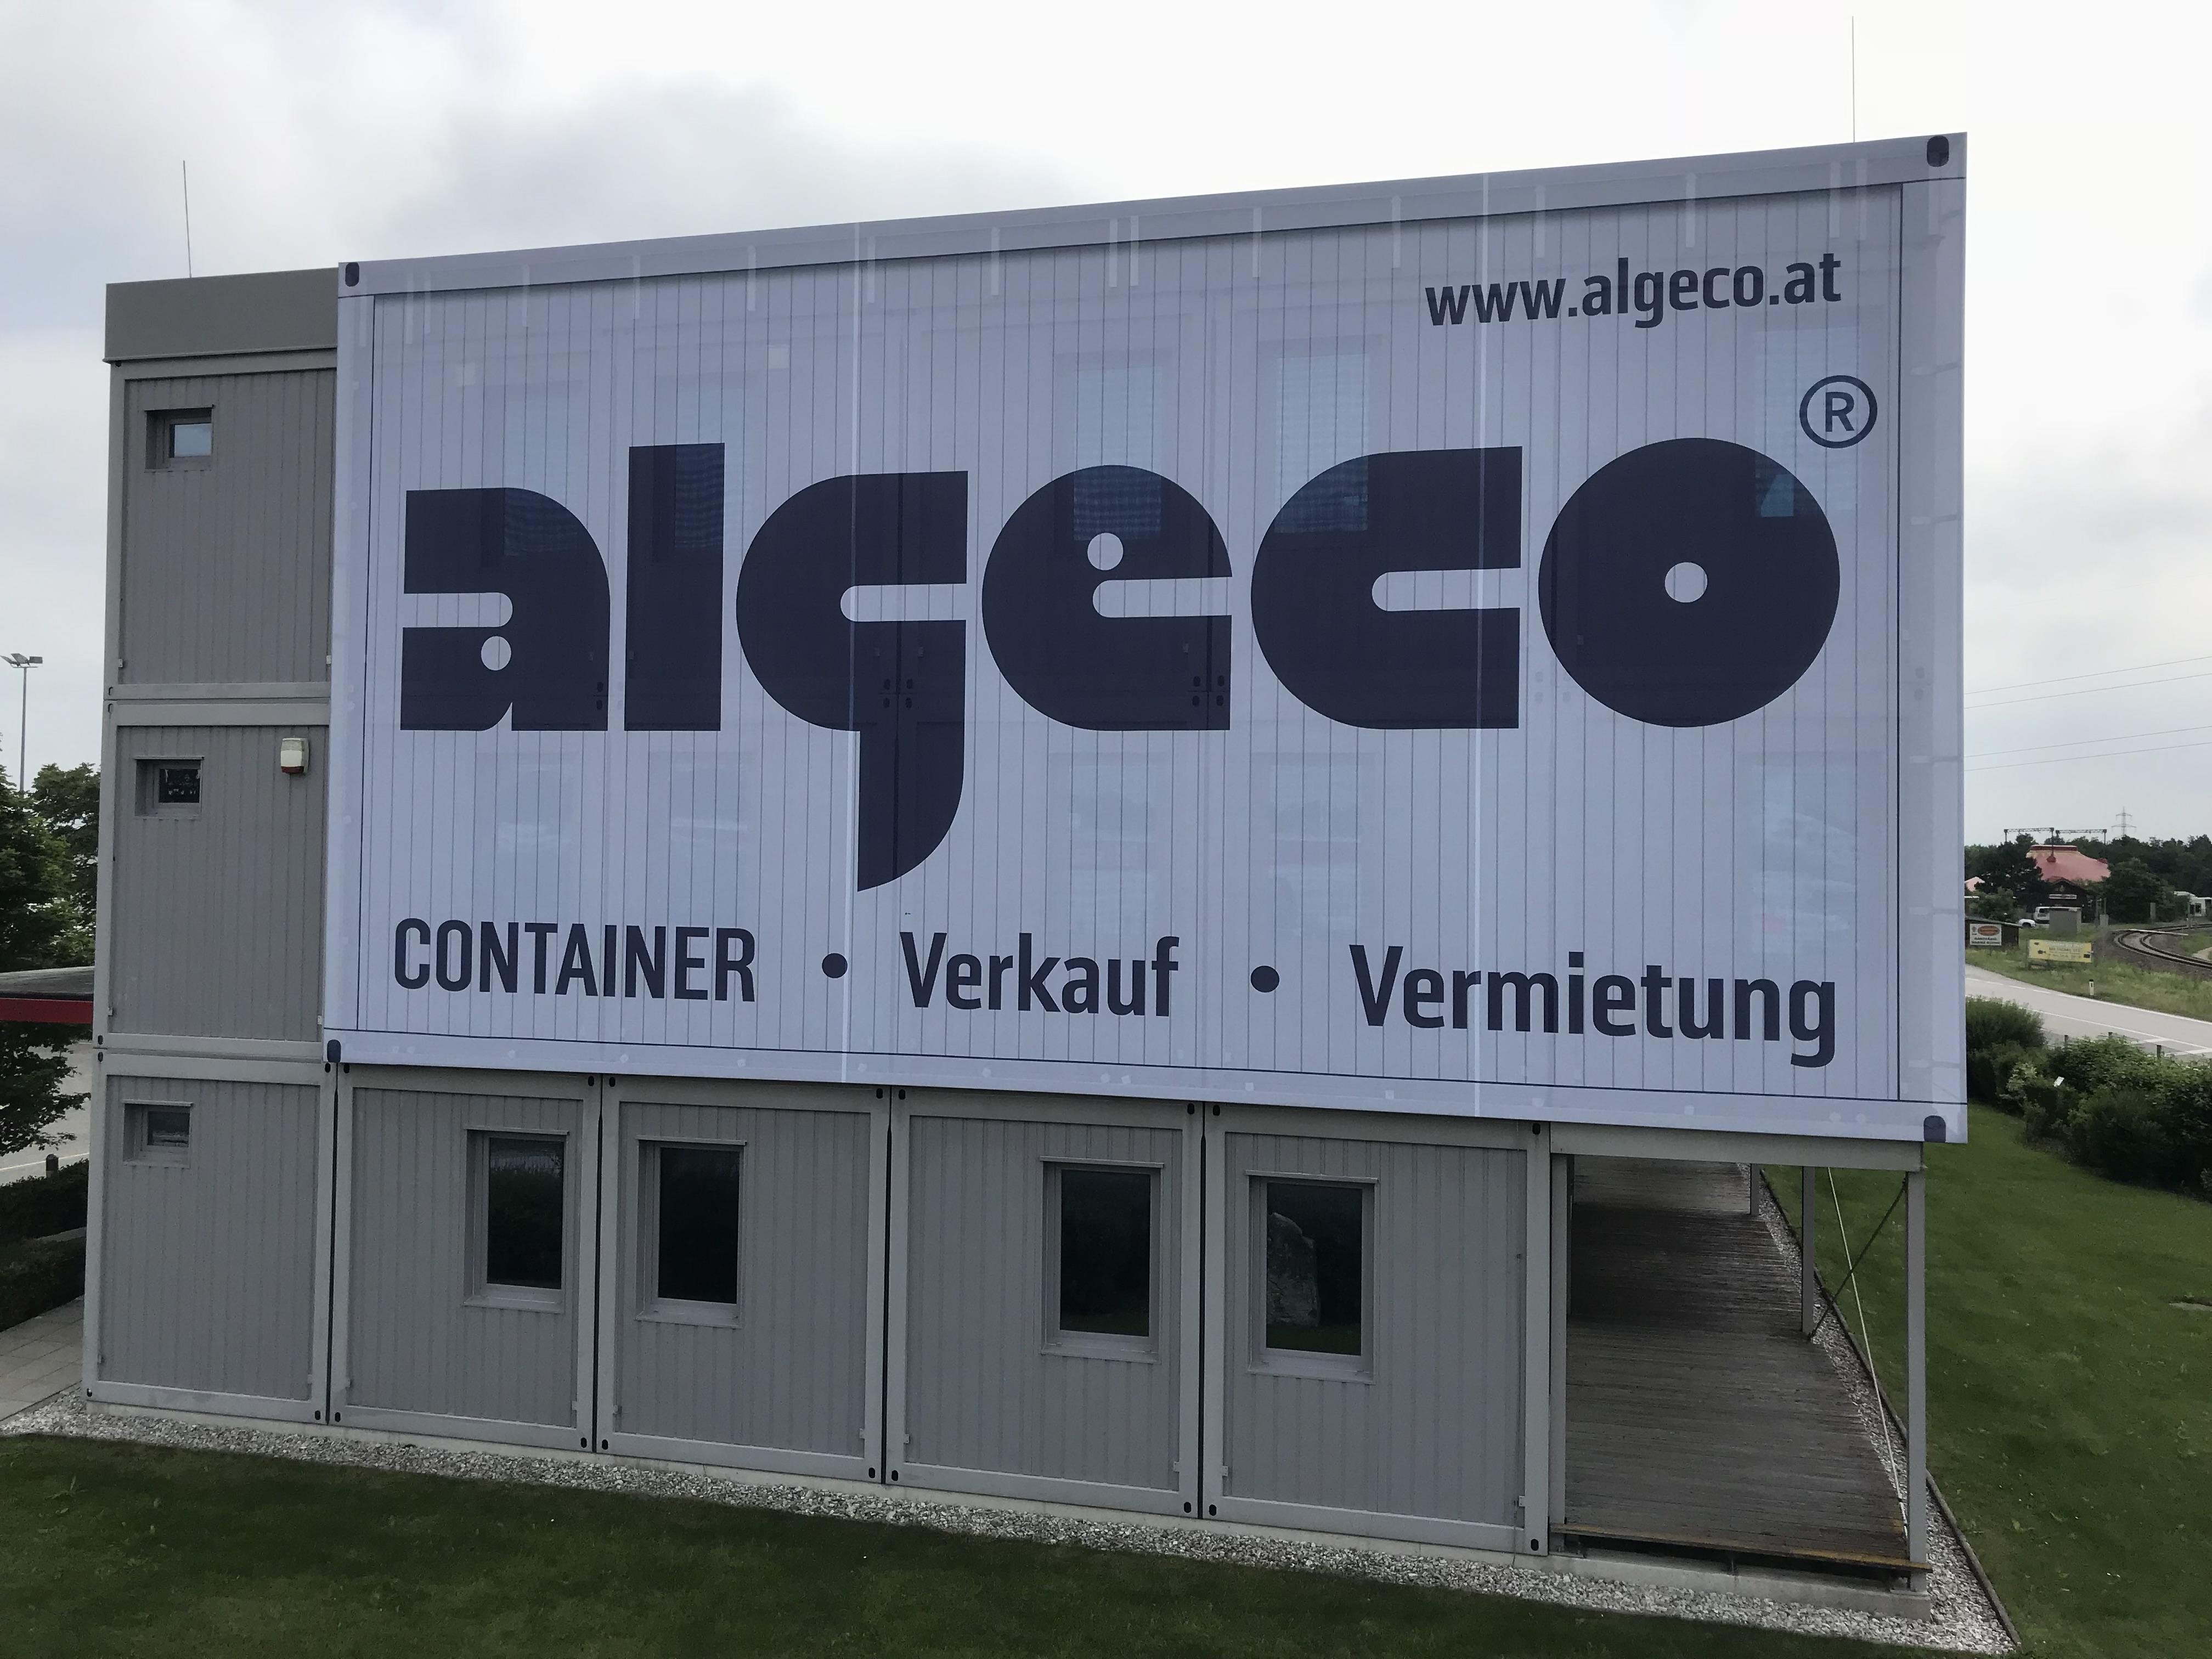 Algeco Austria